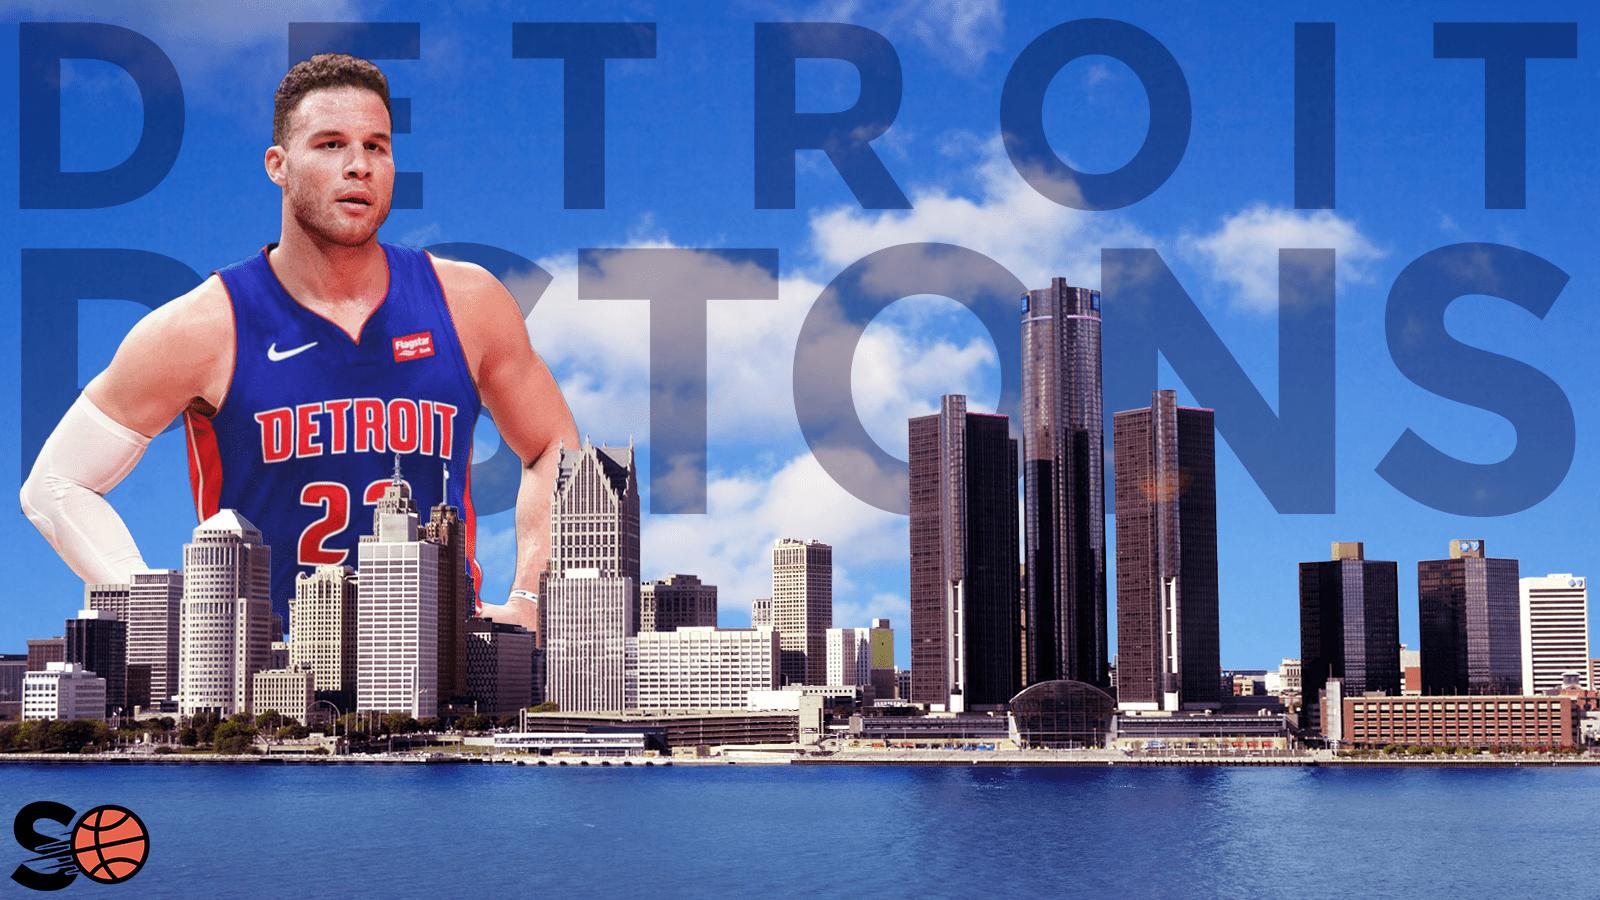 NBA Preview: Detroit Pistons 2019/20